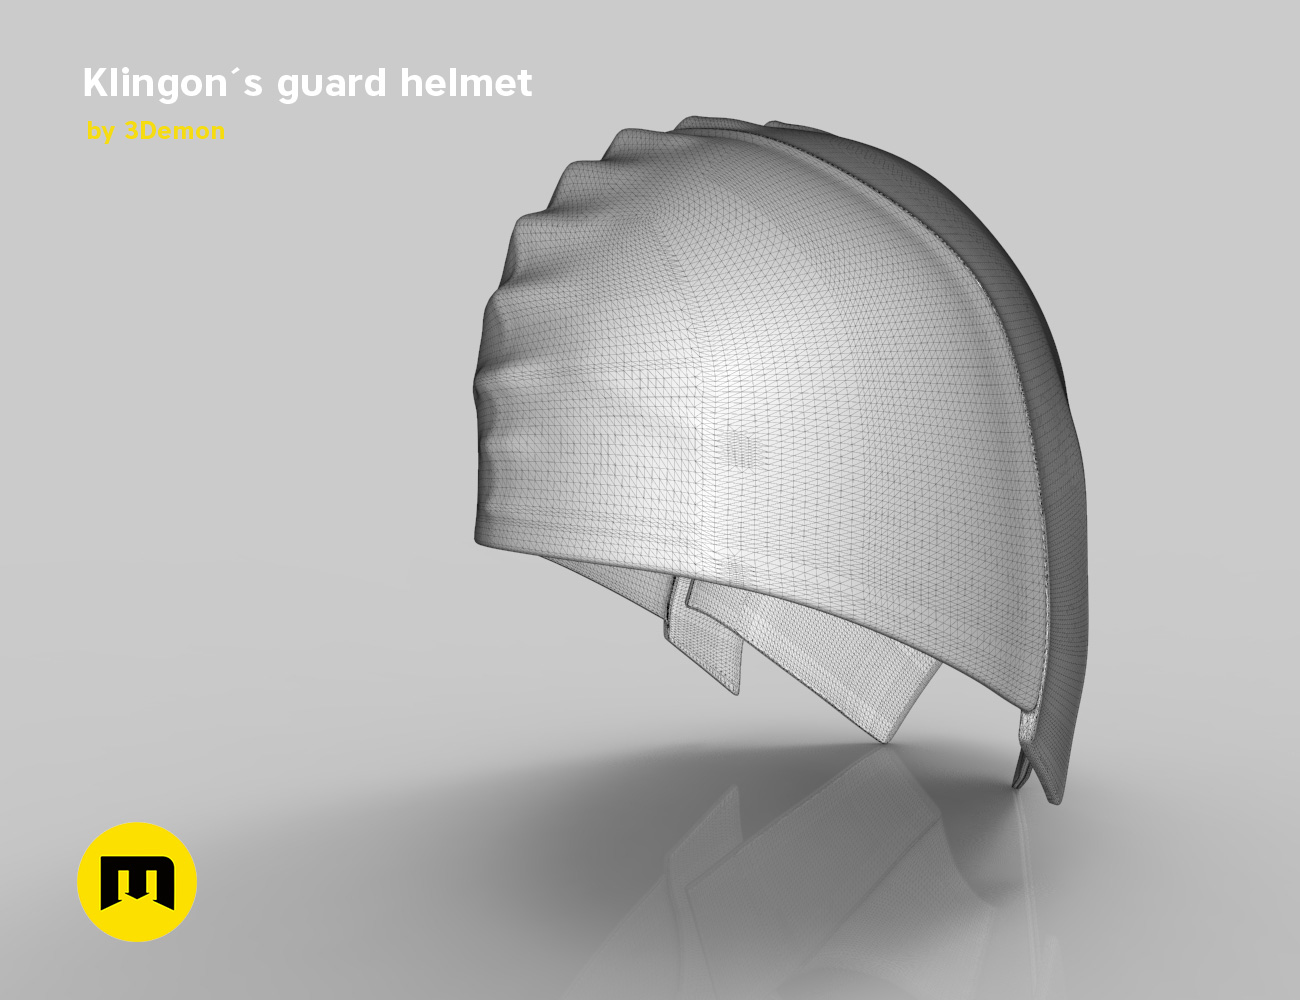 render_klingon_mesh.42.jpg Download STL file Klingon guard helmet • 3D printer object, 3D-mon